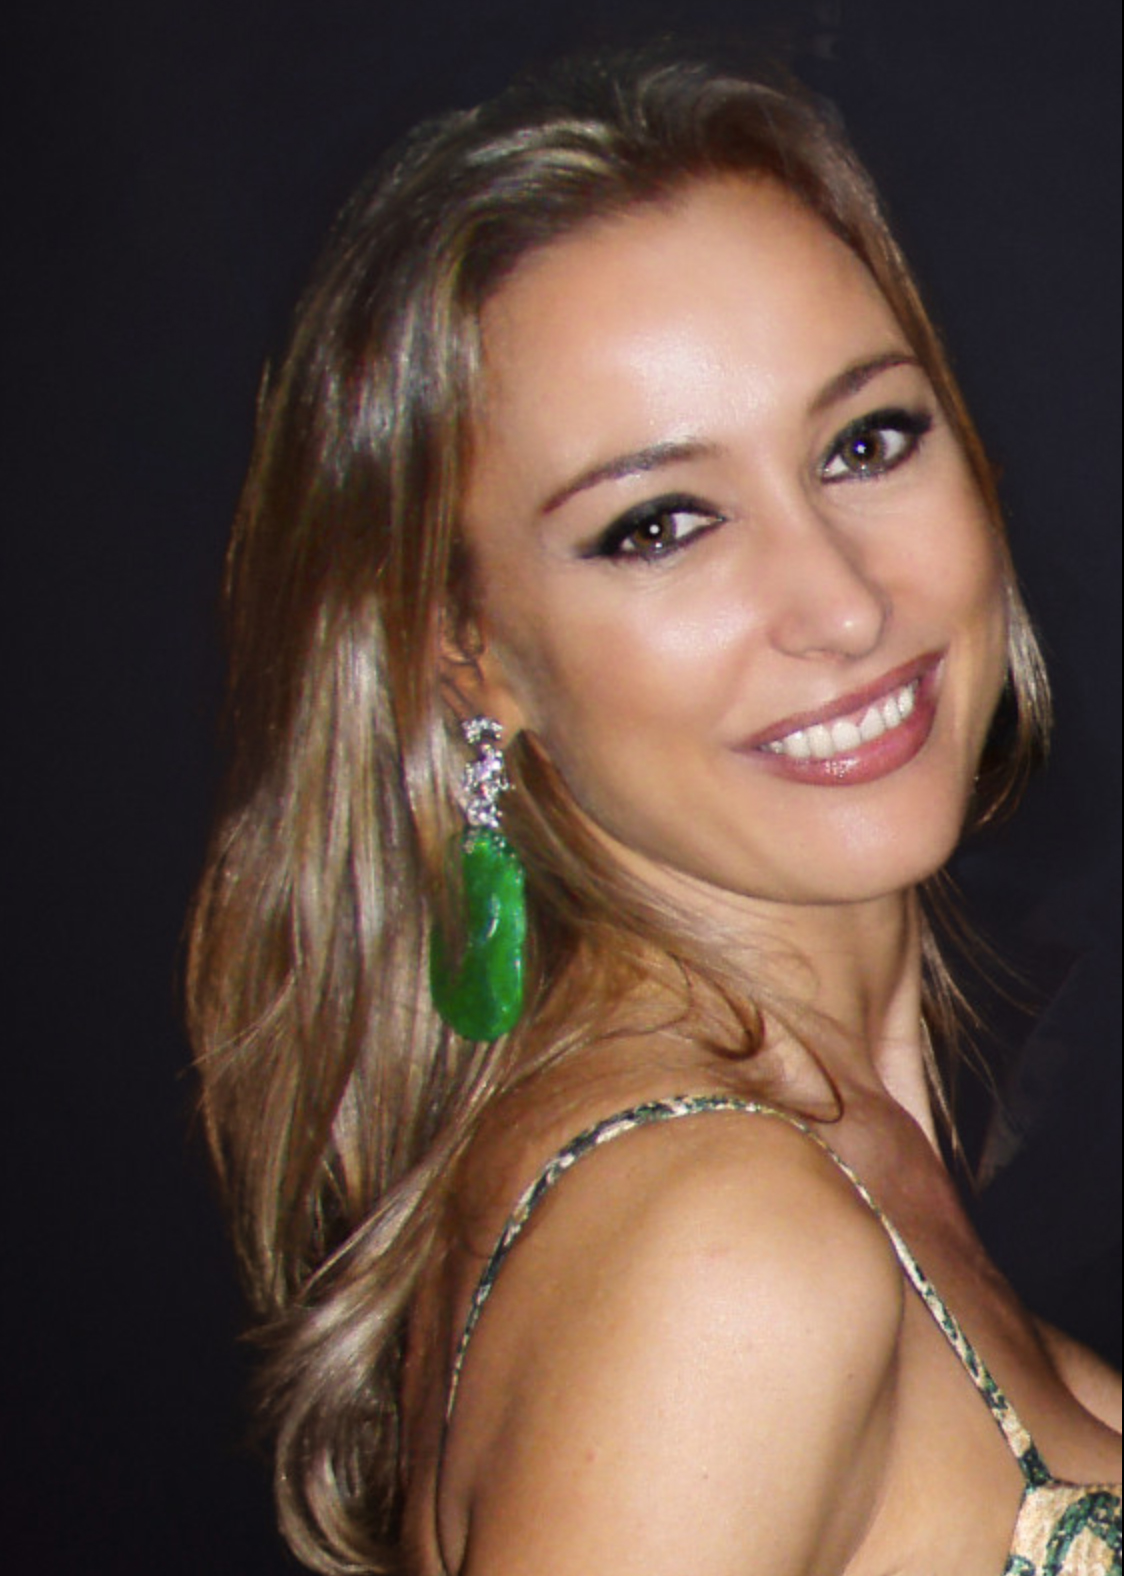 Michela Bruni Reichlin